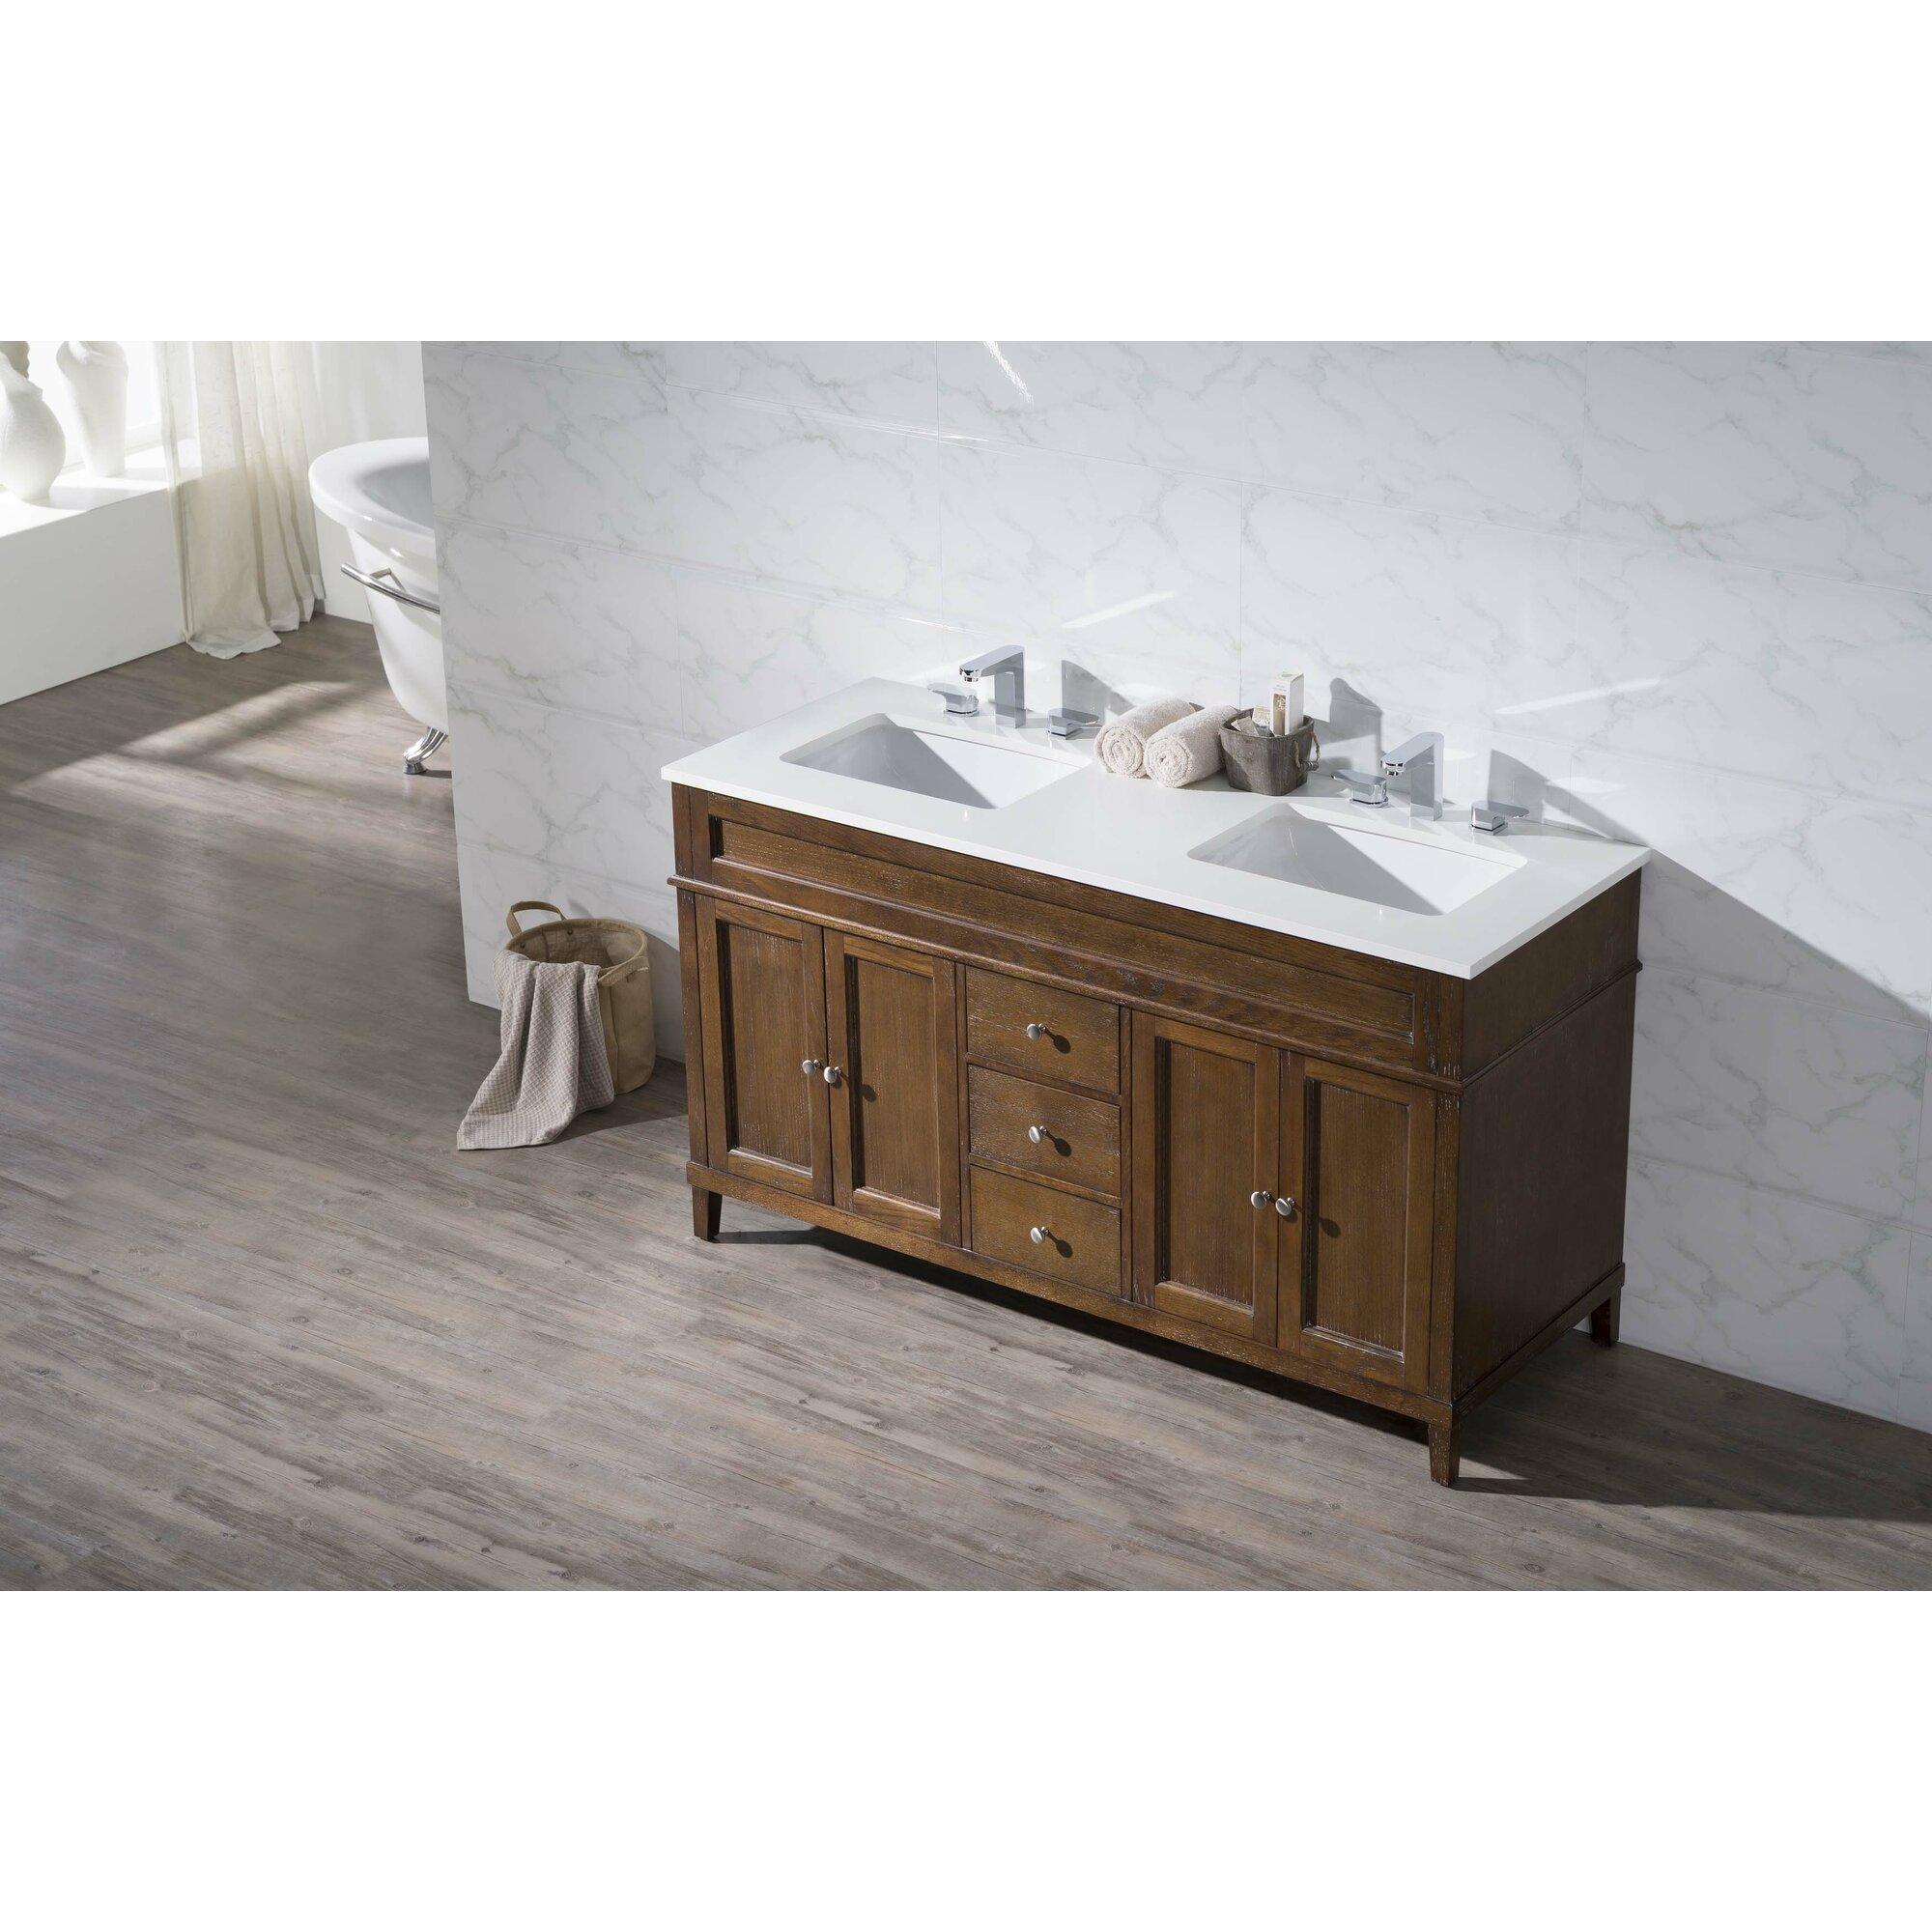 Dcor Design Oakmont 59 Double Sink Bathroom Vanity Set Reviews Wayfair